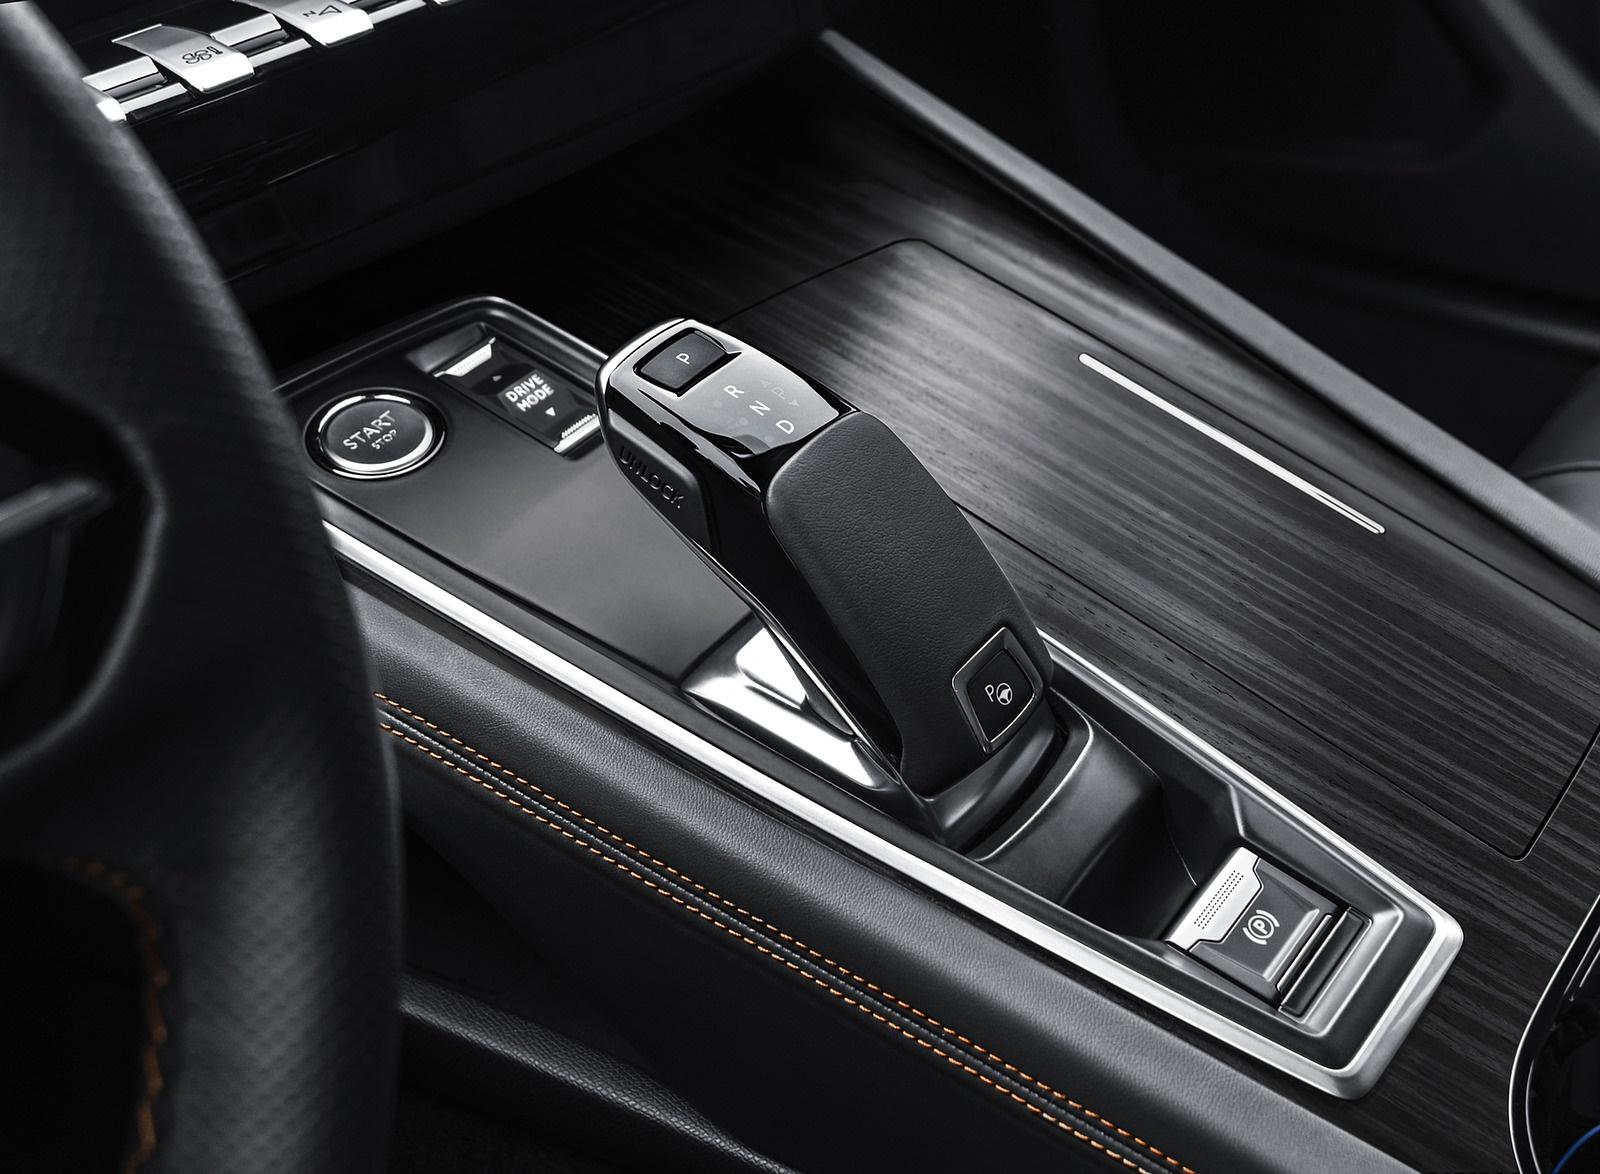 2019 Peugeot 508 Interior Detail Wallpapers (5)